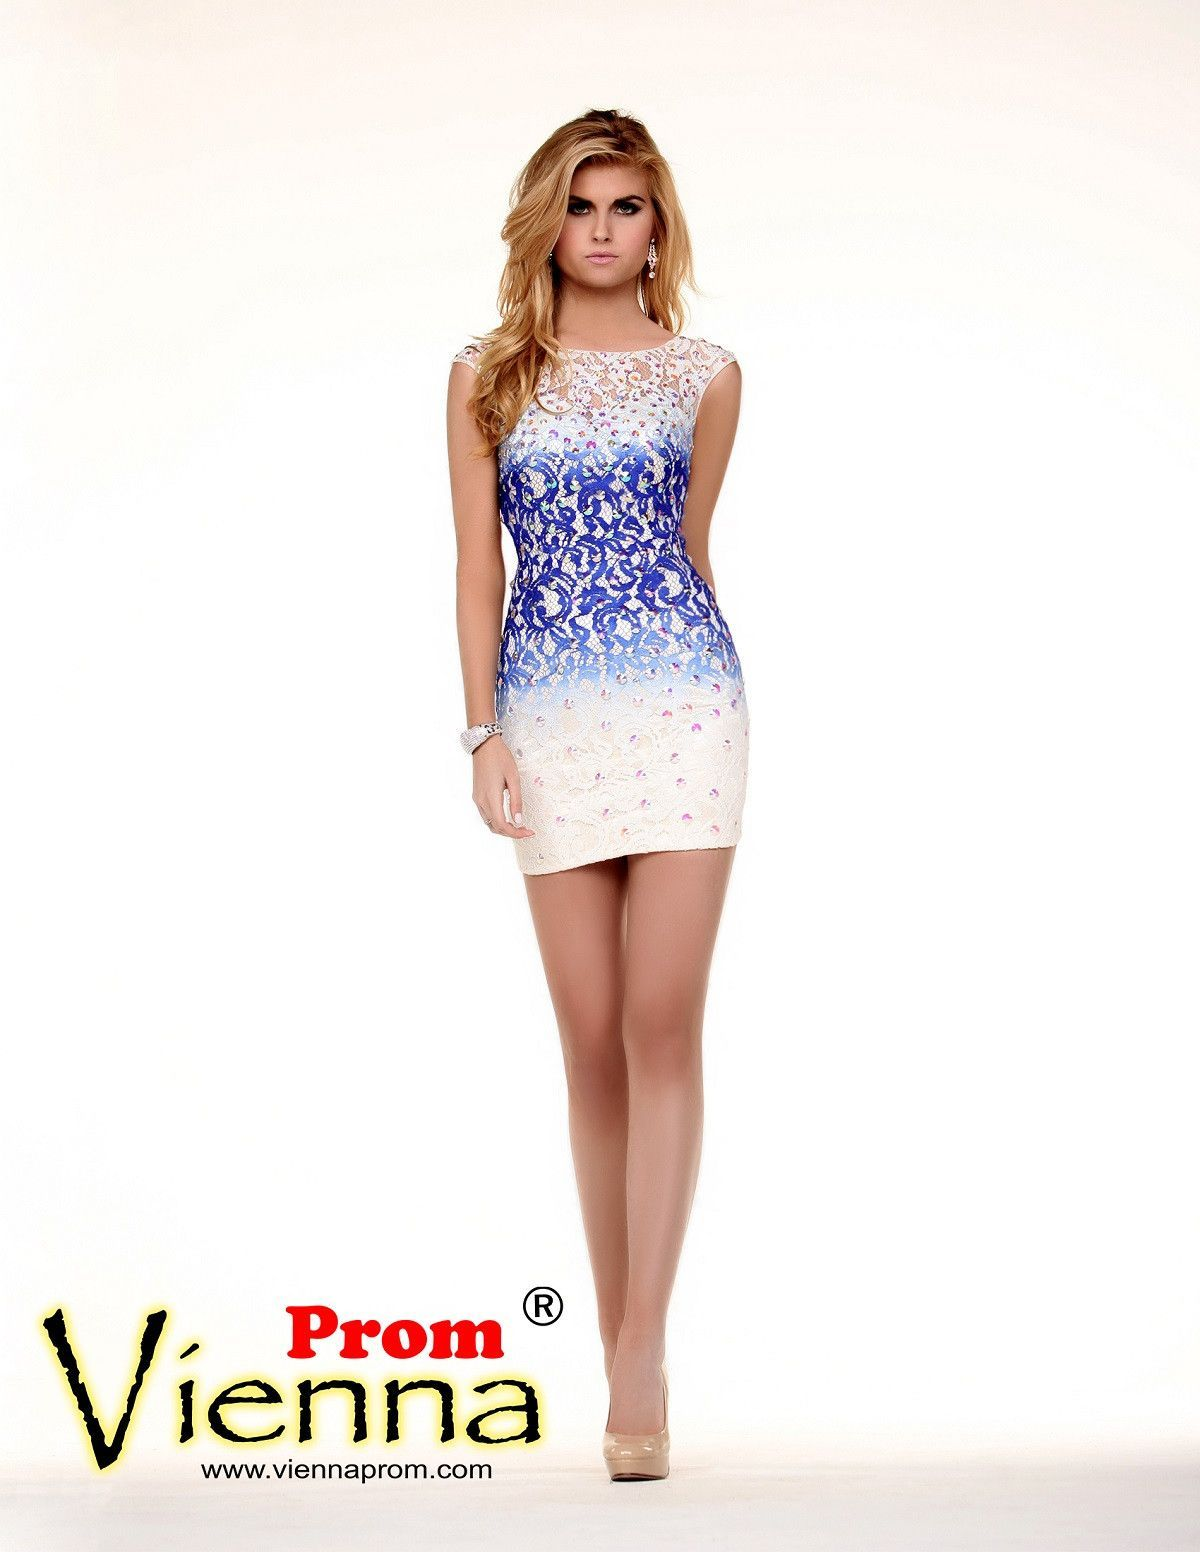 Vienna Prom 1003 Short Homecoming Dress Dresses Short Dresses Short Homecoming Dress [ 1552 x 1200 Pixel ]